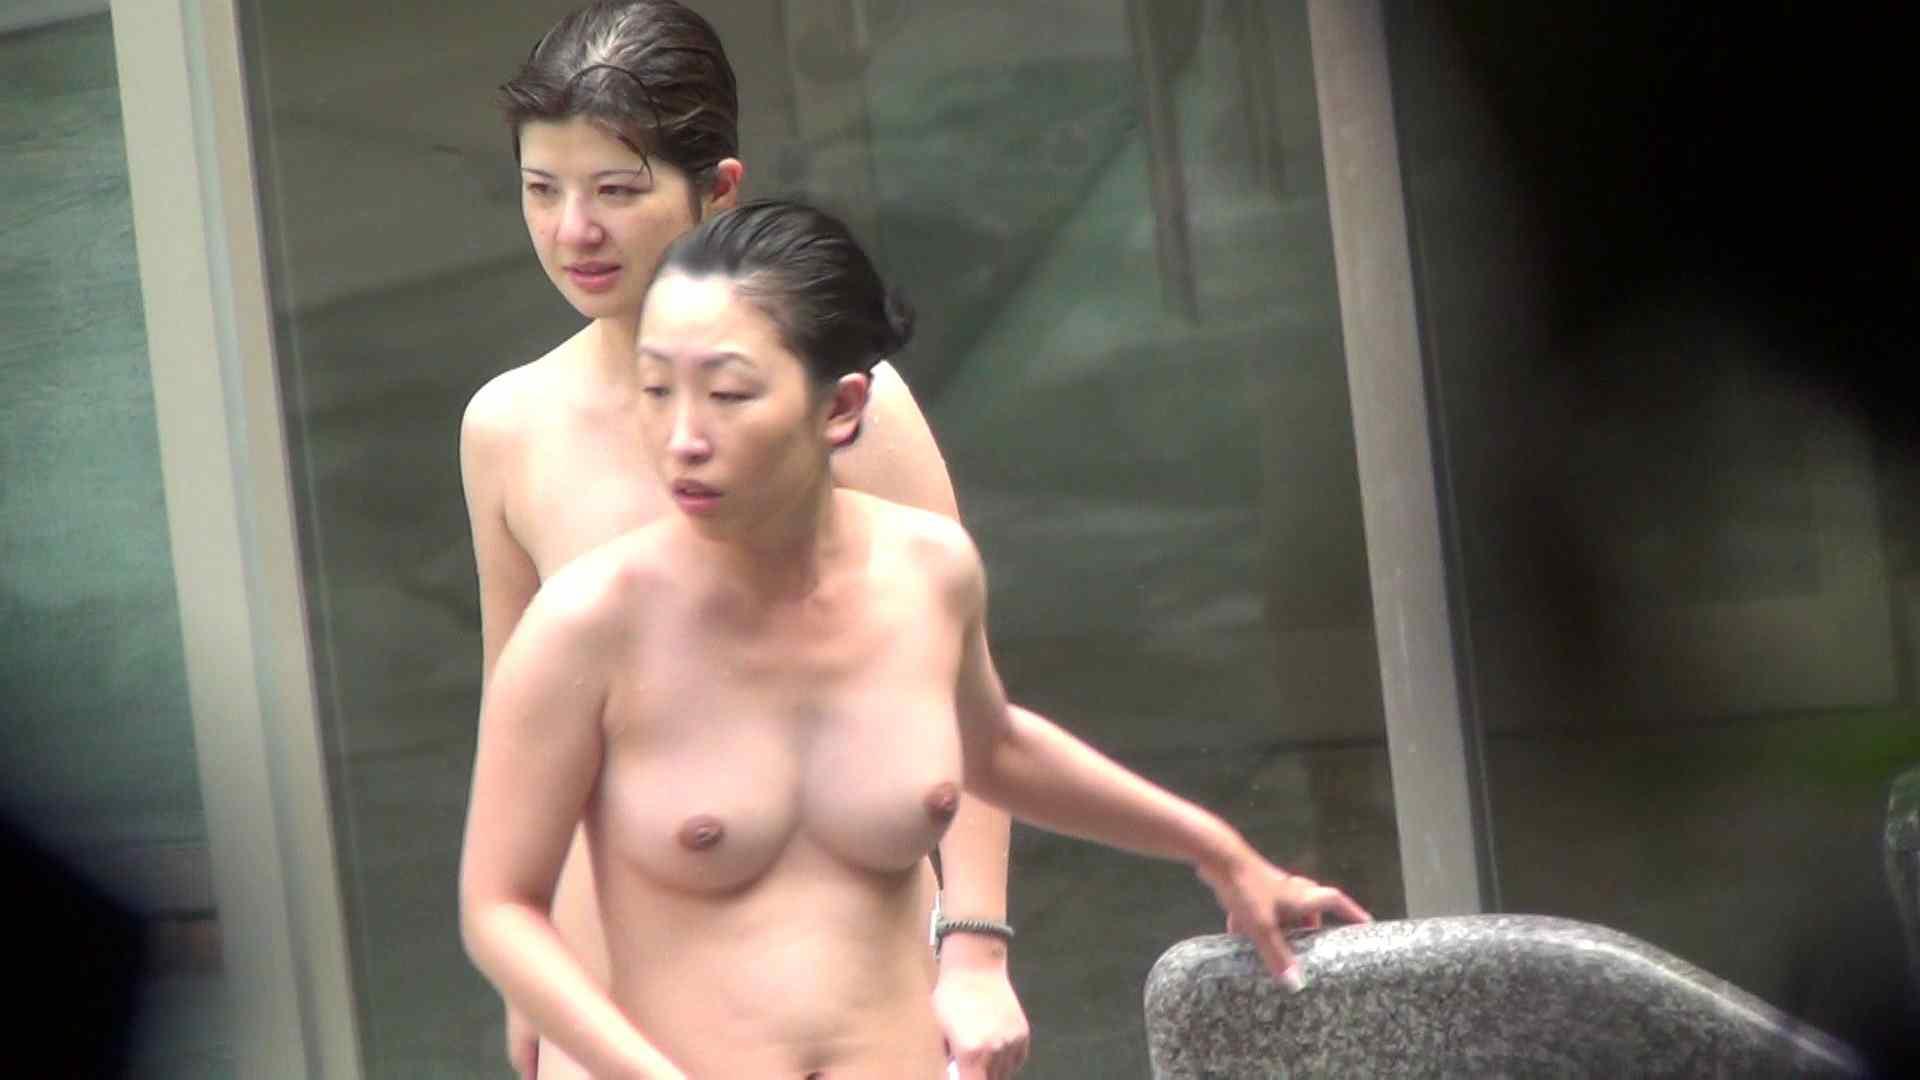 Aquaな露天風呂Vol.262 HなOL | 盗撮  73pic 44